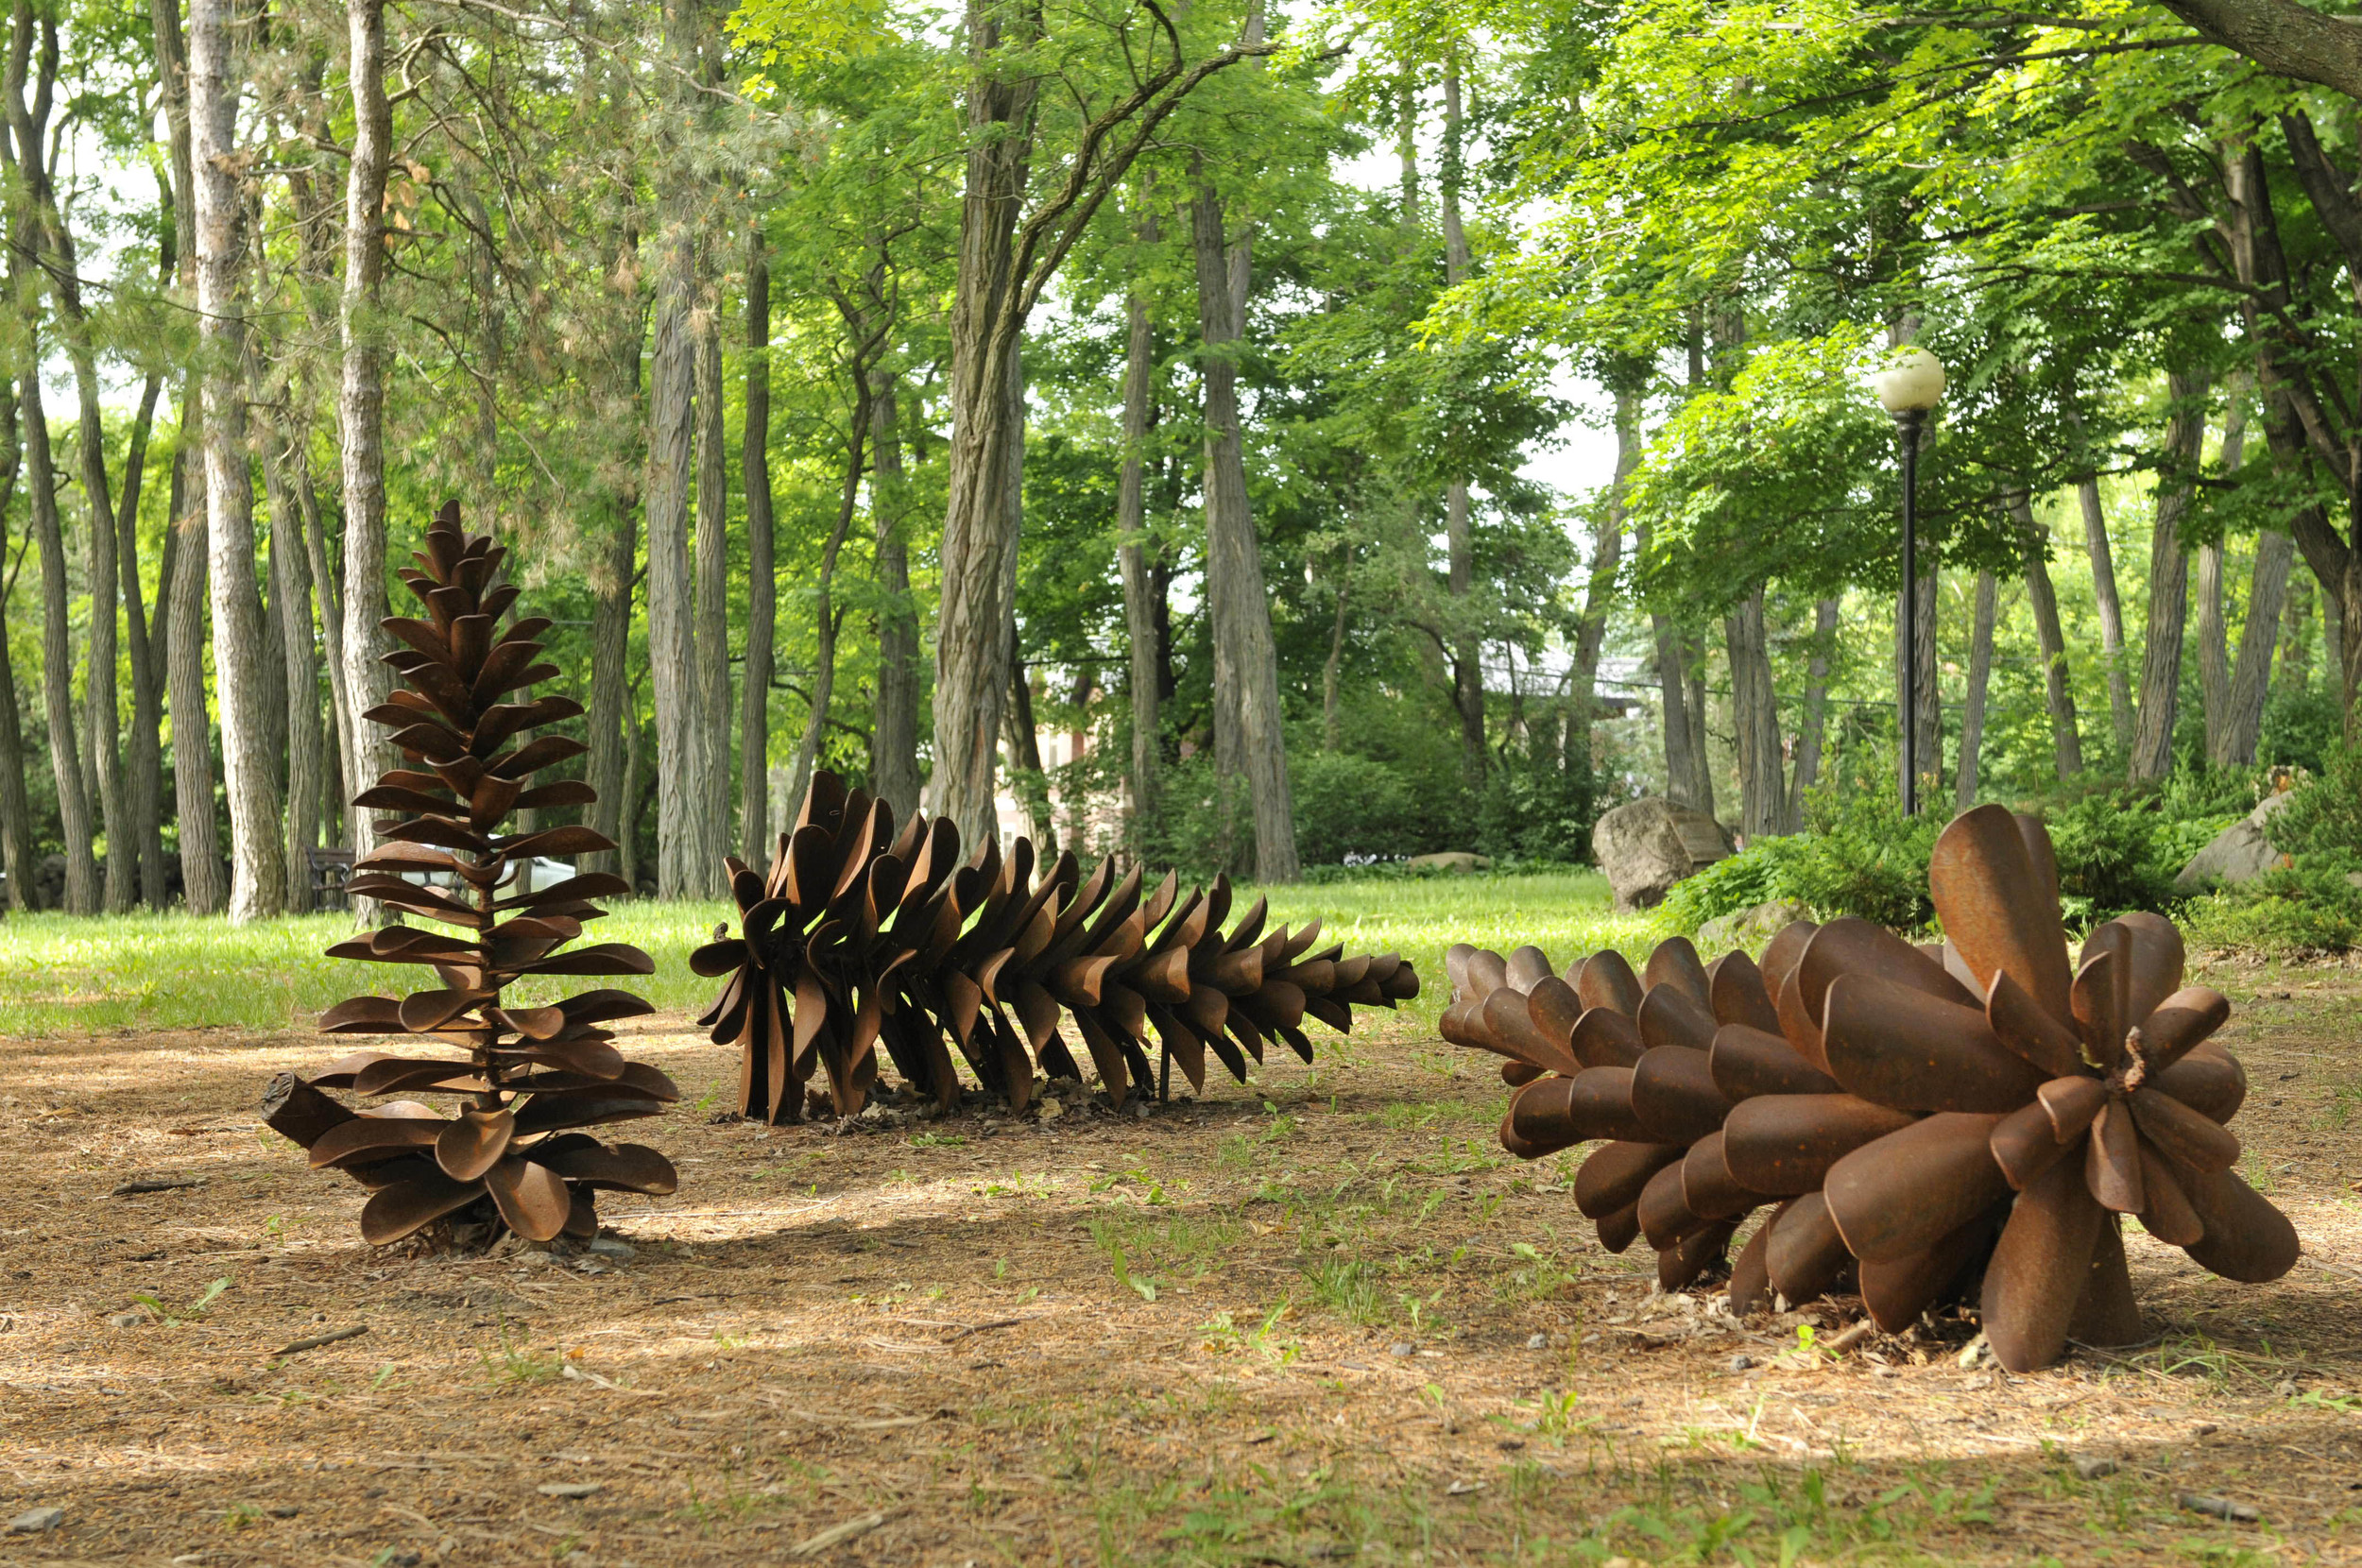 Elzinga Rockcliffe Cones D1600713.JPG